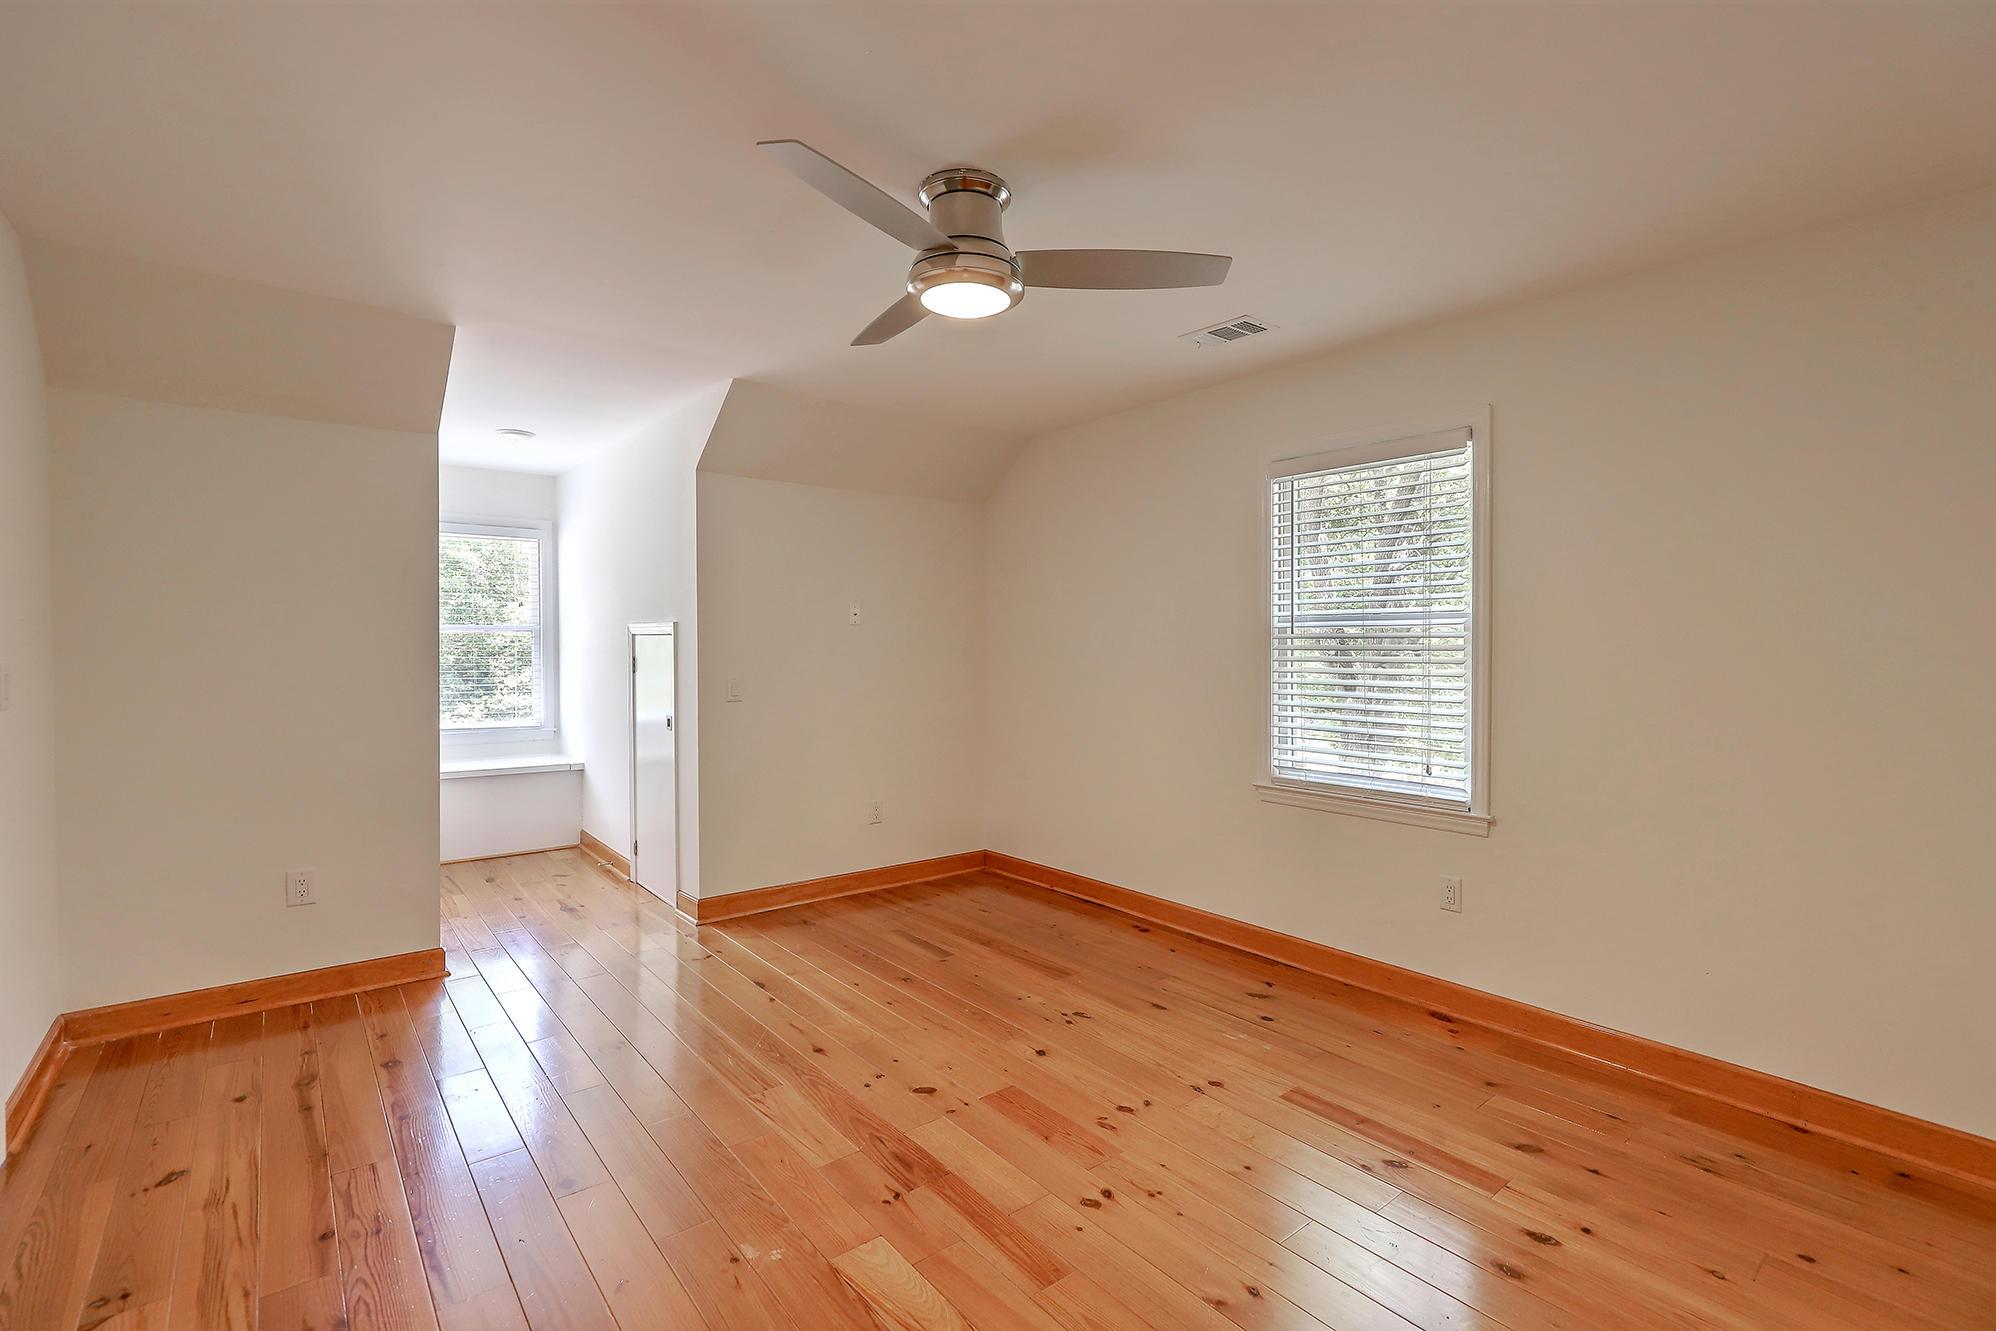 Edgewater Park Homes For Sale - 1413 Edsent, Charleston, SC - 15